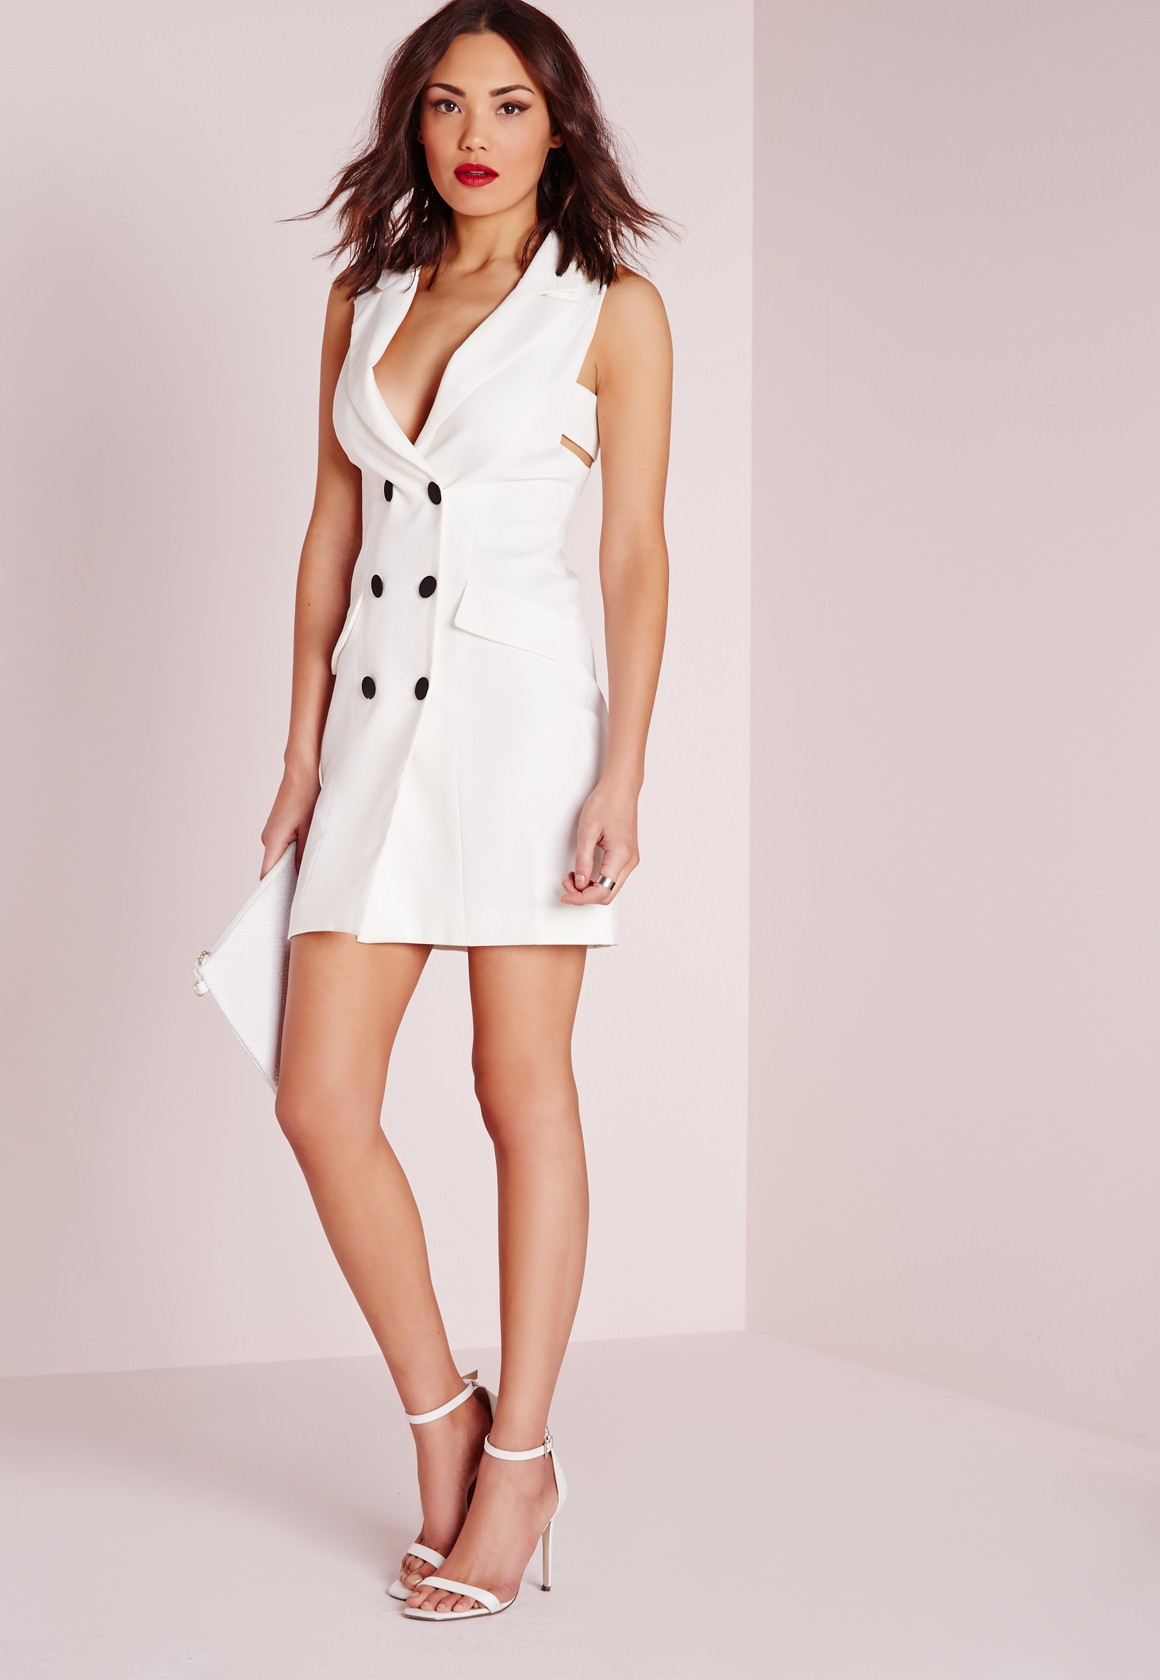 046d09ce8b931 Lyst - Missguided Crepe Sleeveless Blazer Dress White in White